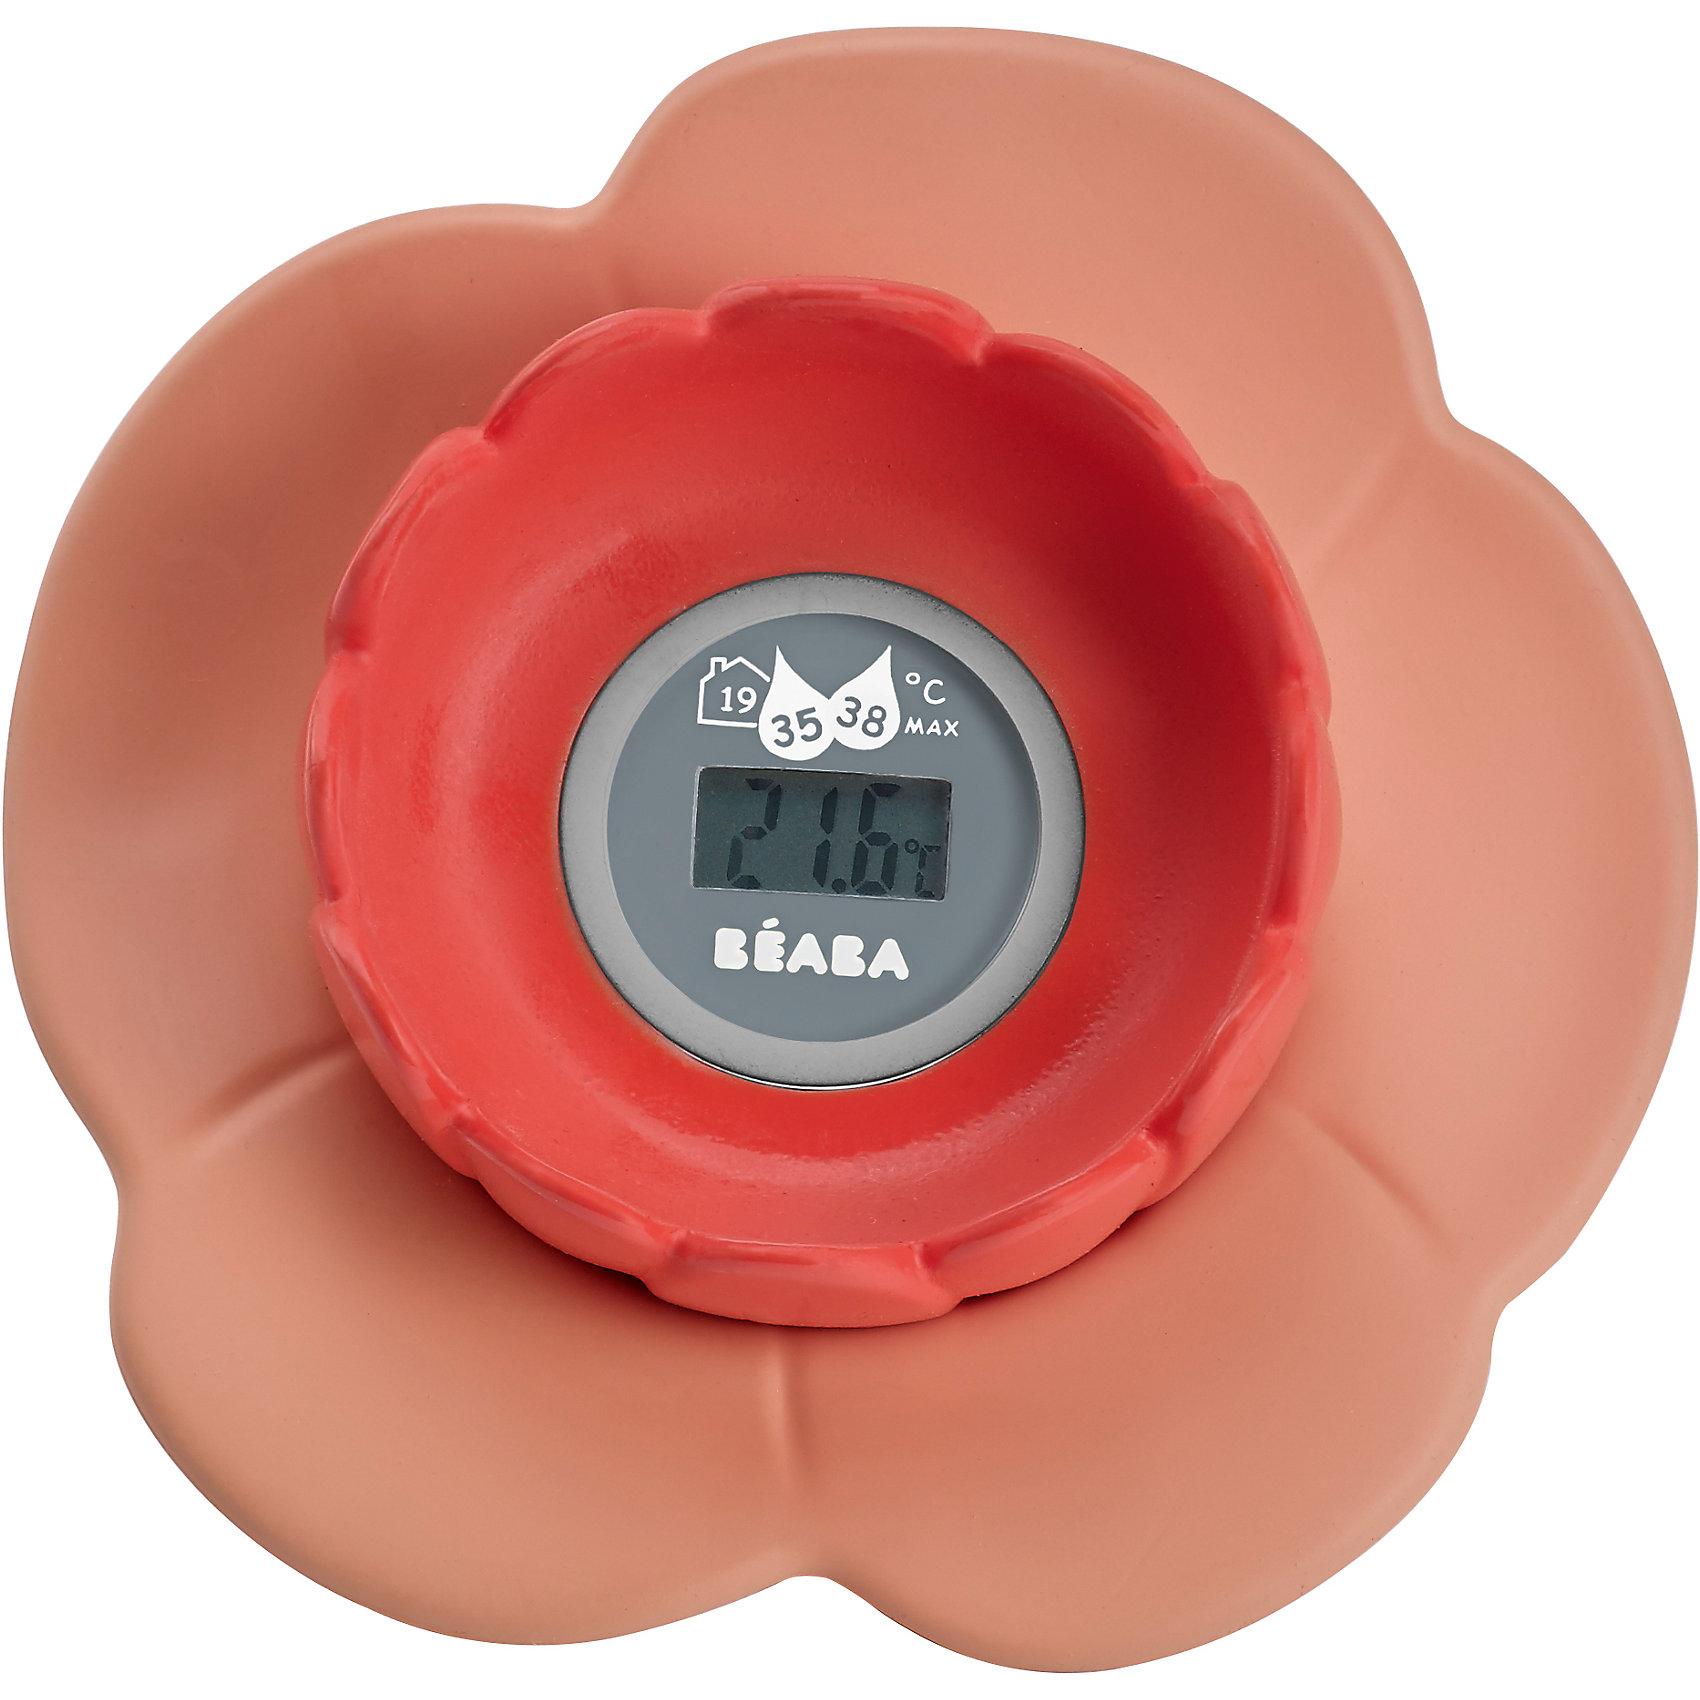 BEABA Цифровой термометр LOTUS, Beaba, бежевый